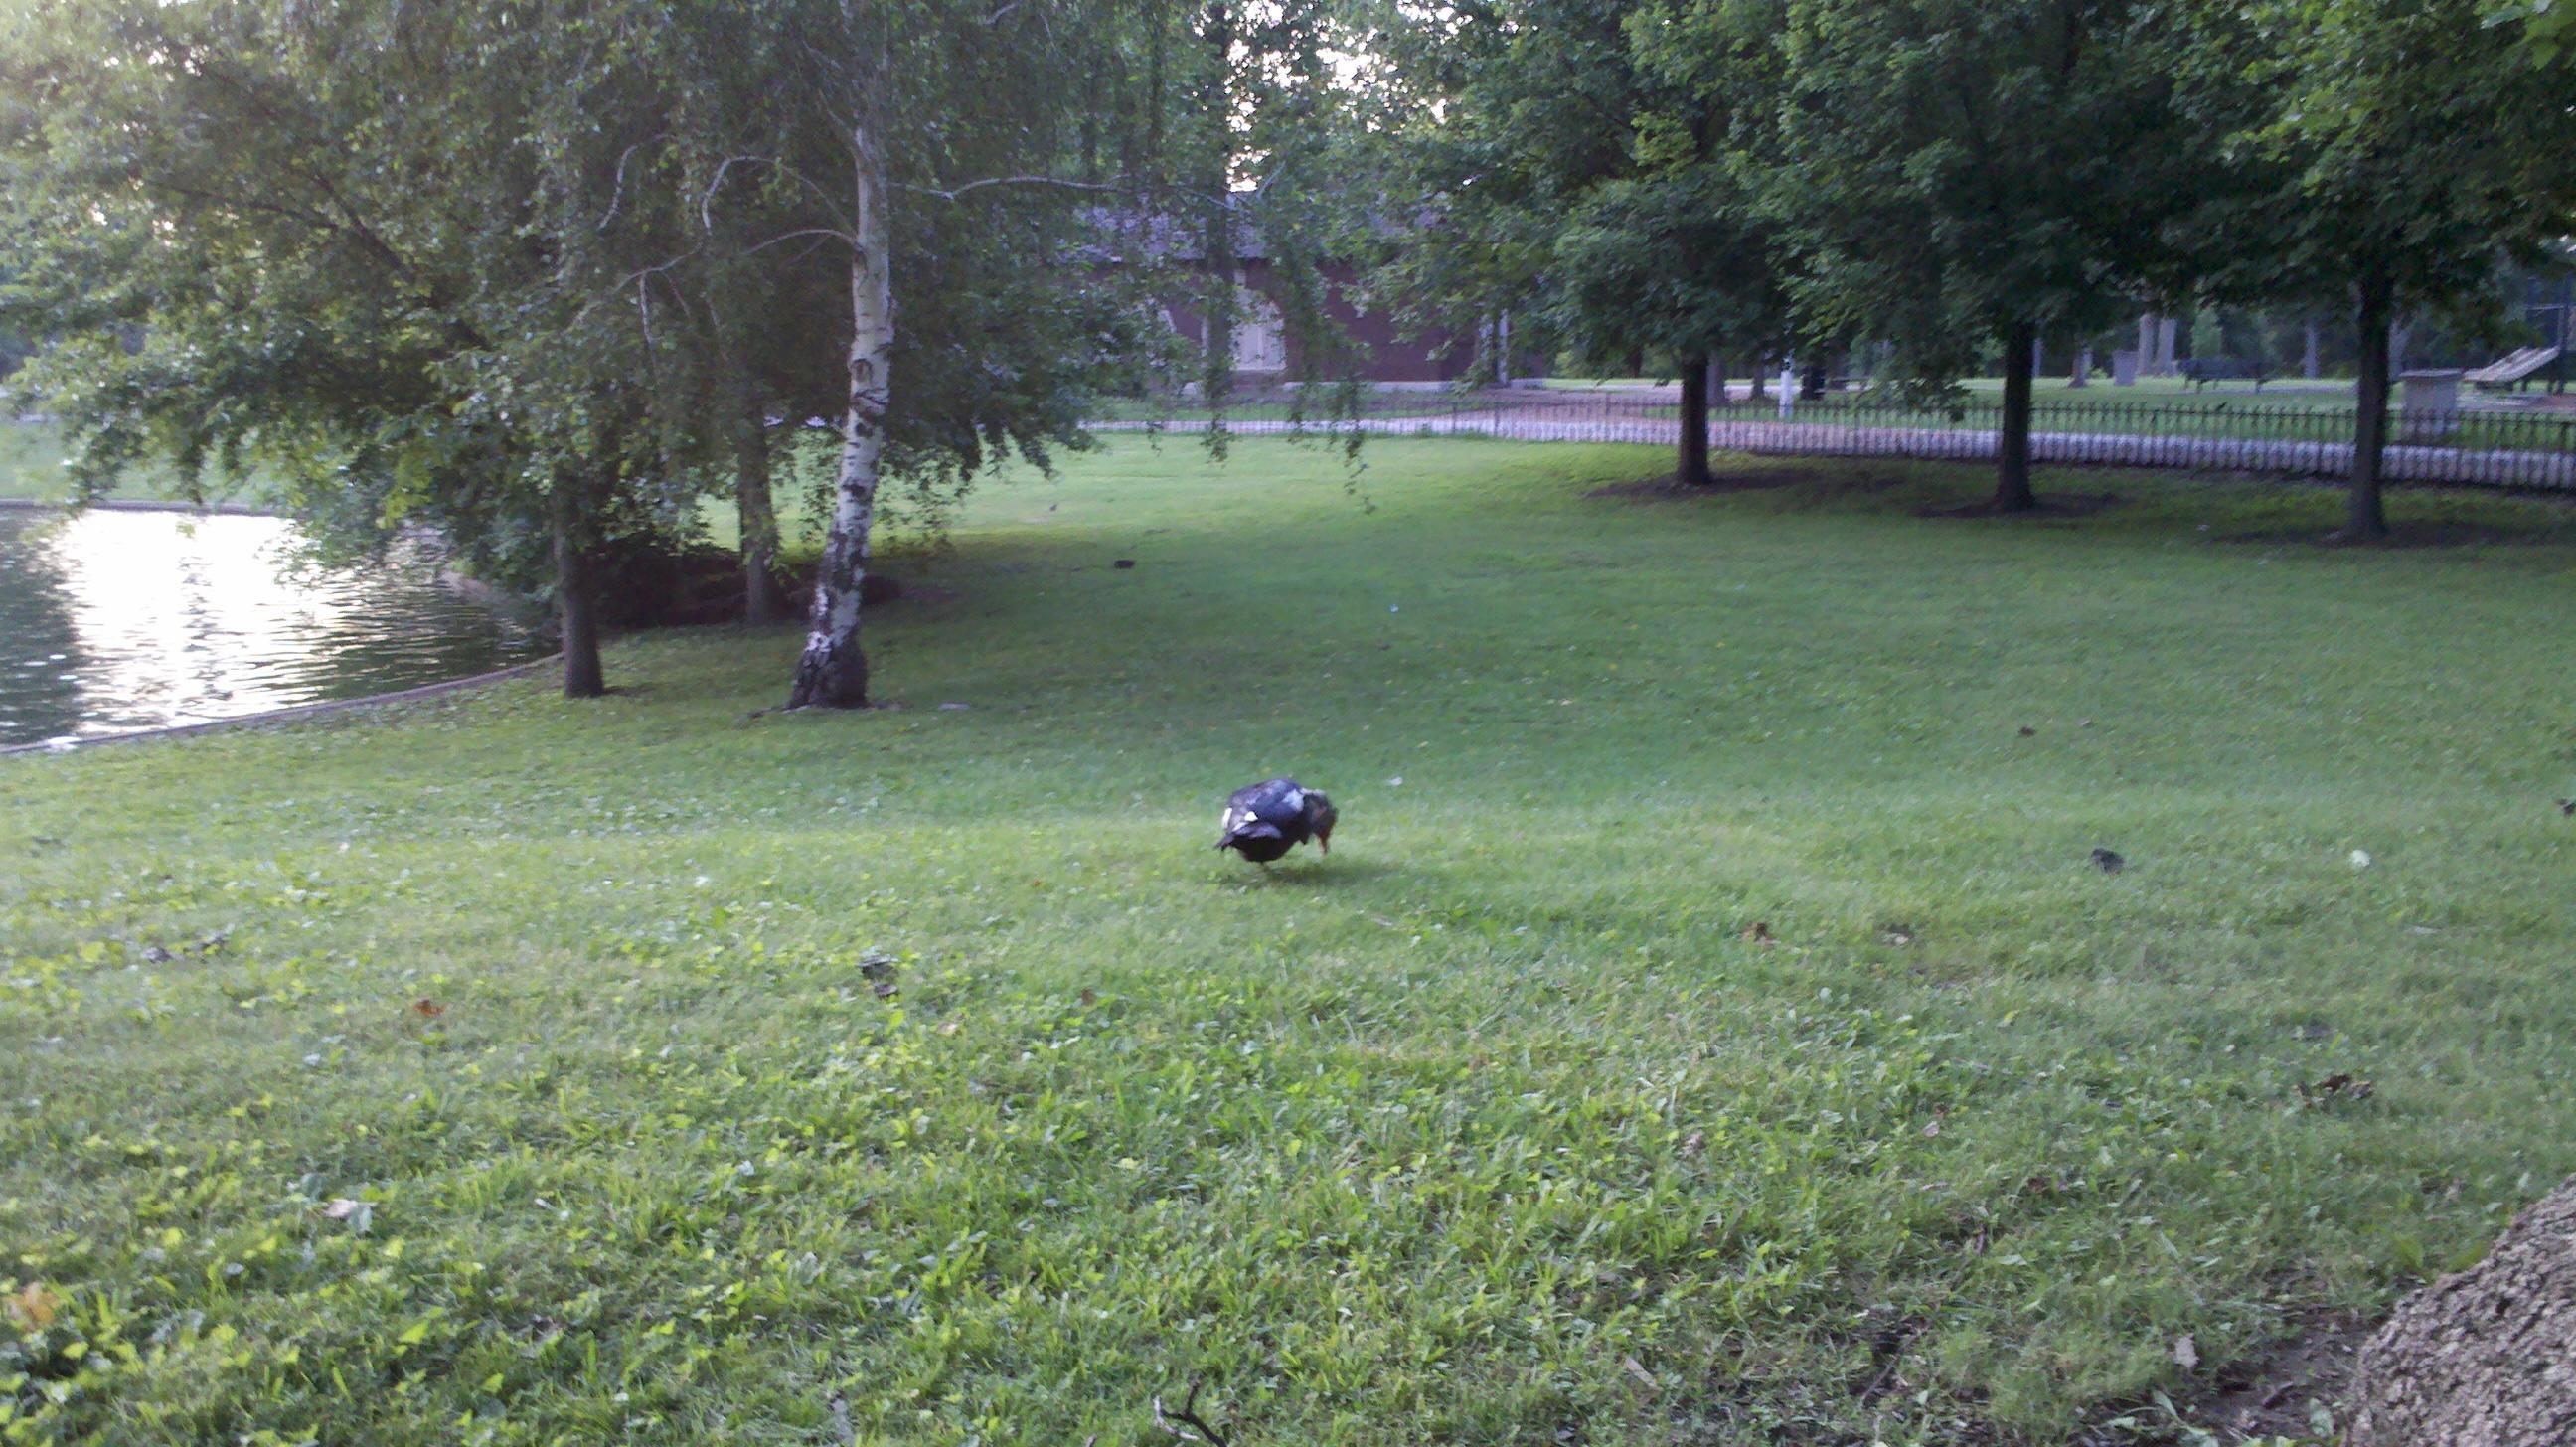 Duck in Lafayette Park, St. Louis, Missouri